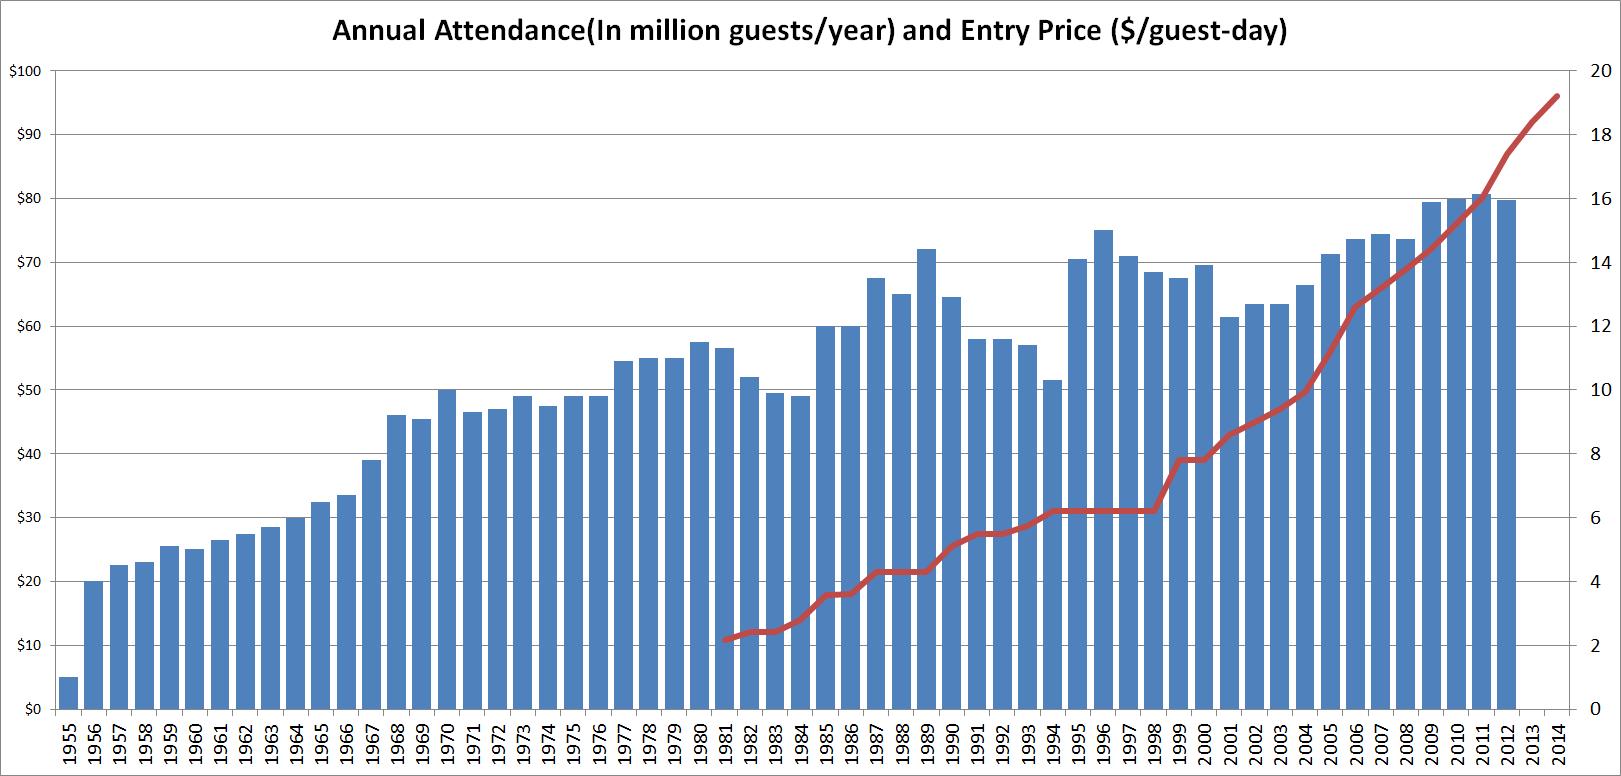 Attendance of Disneyland Park